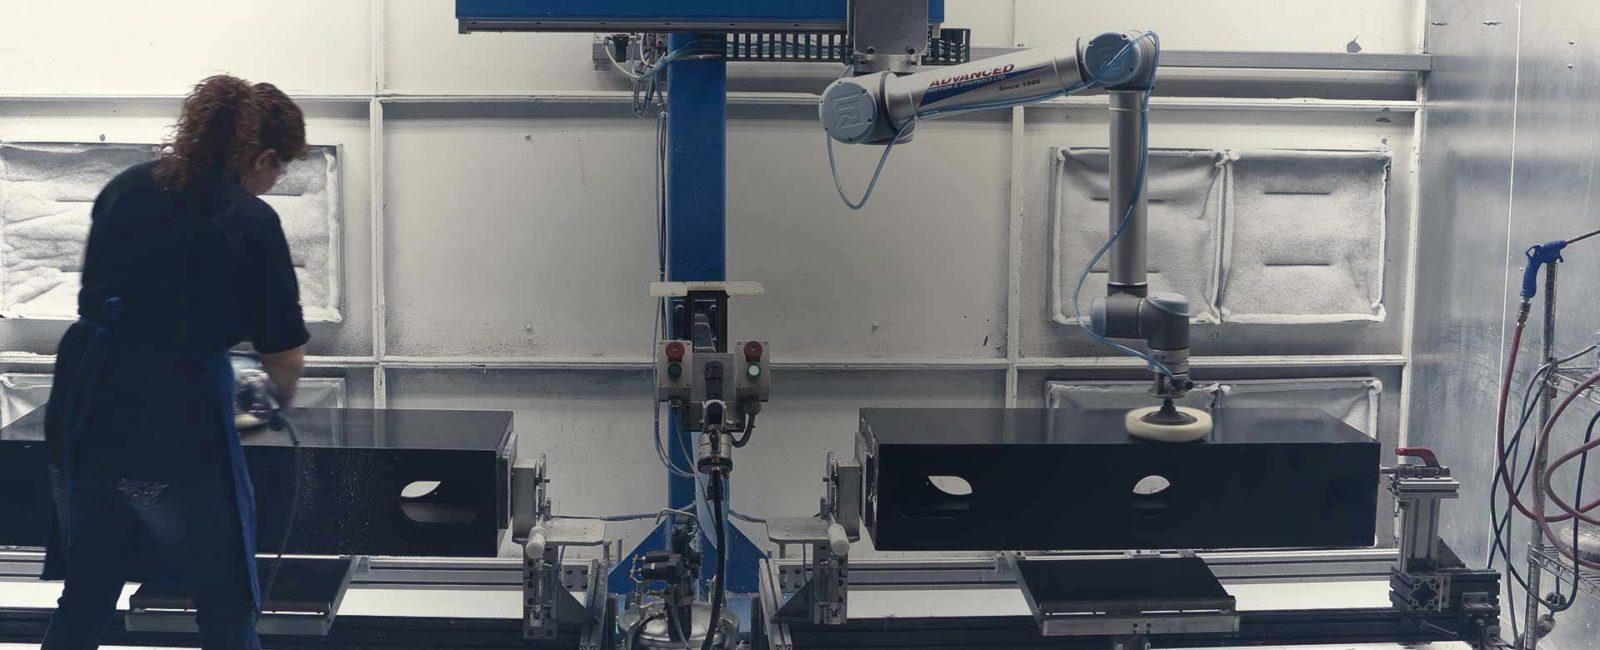 robot de pulido automatico